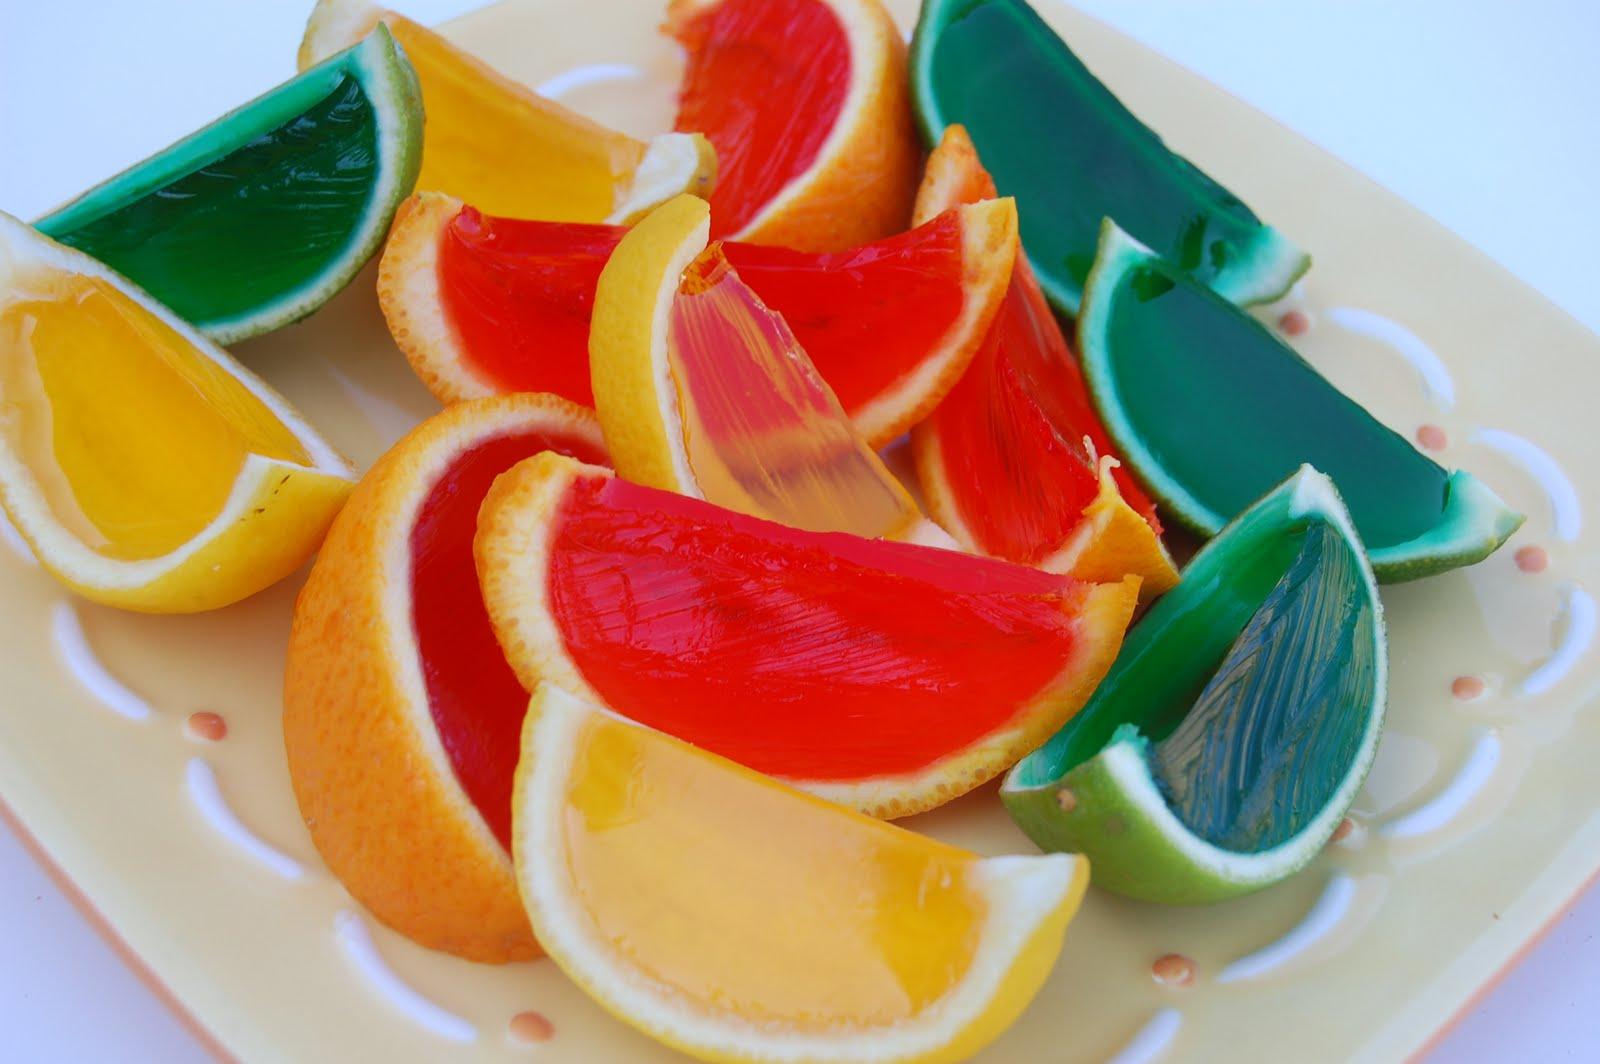 Gelatinas de té con fruta